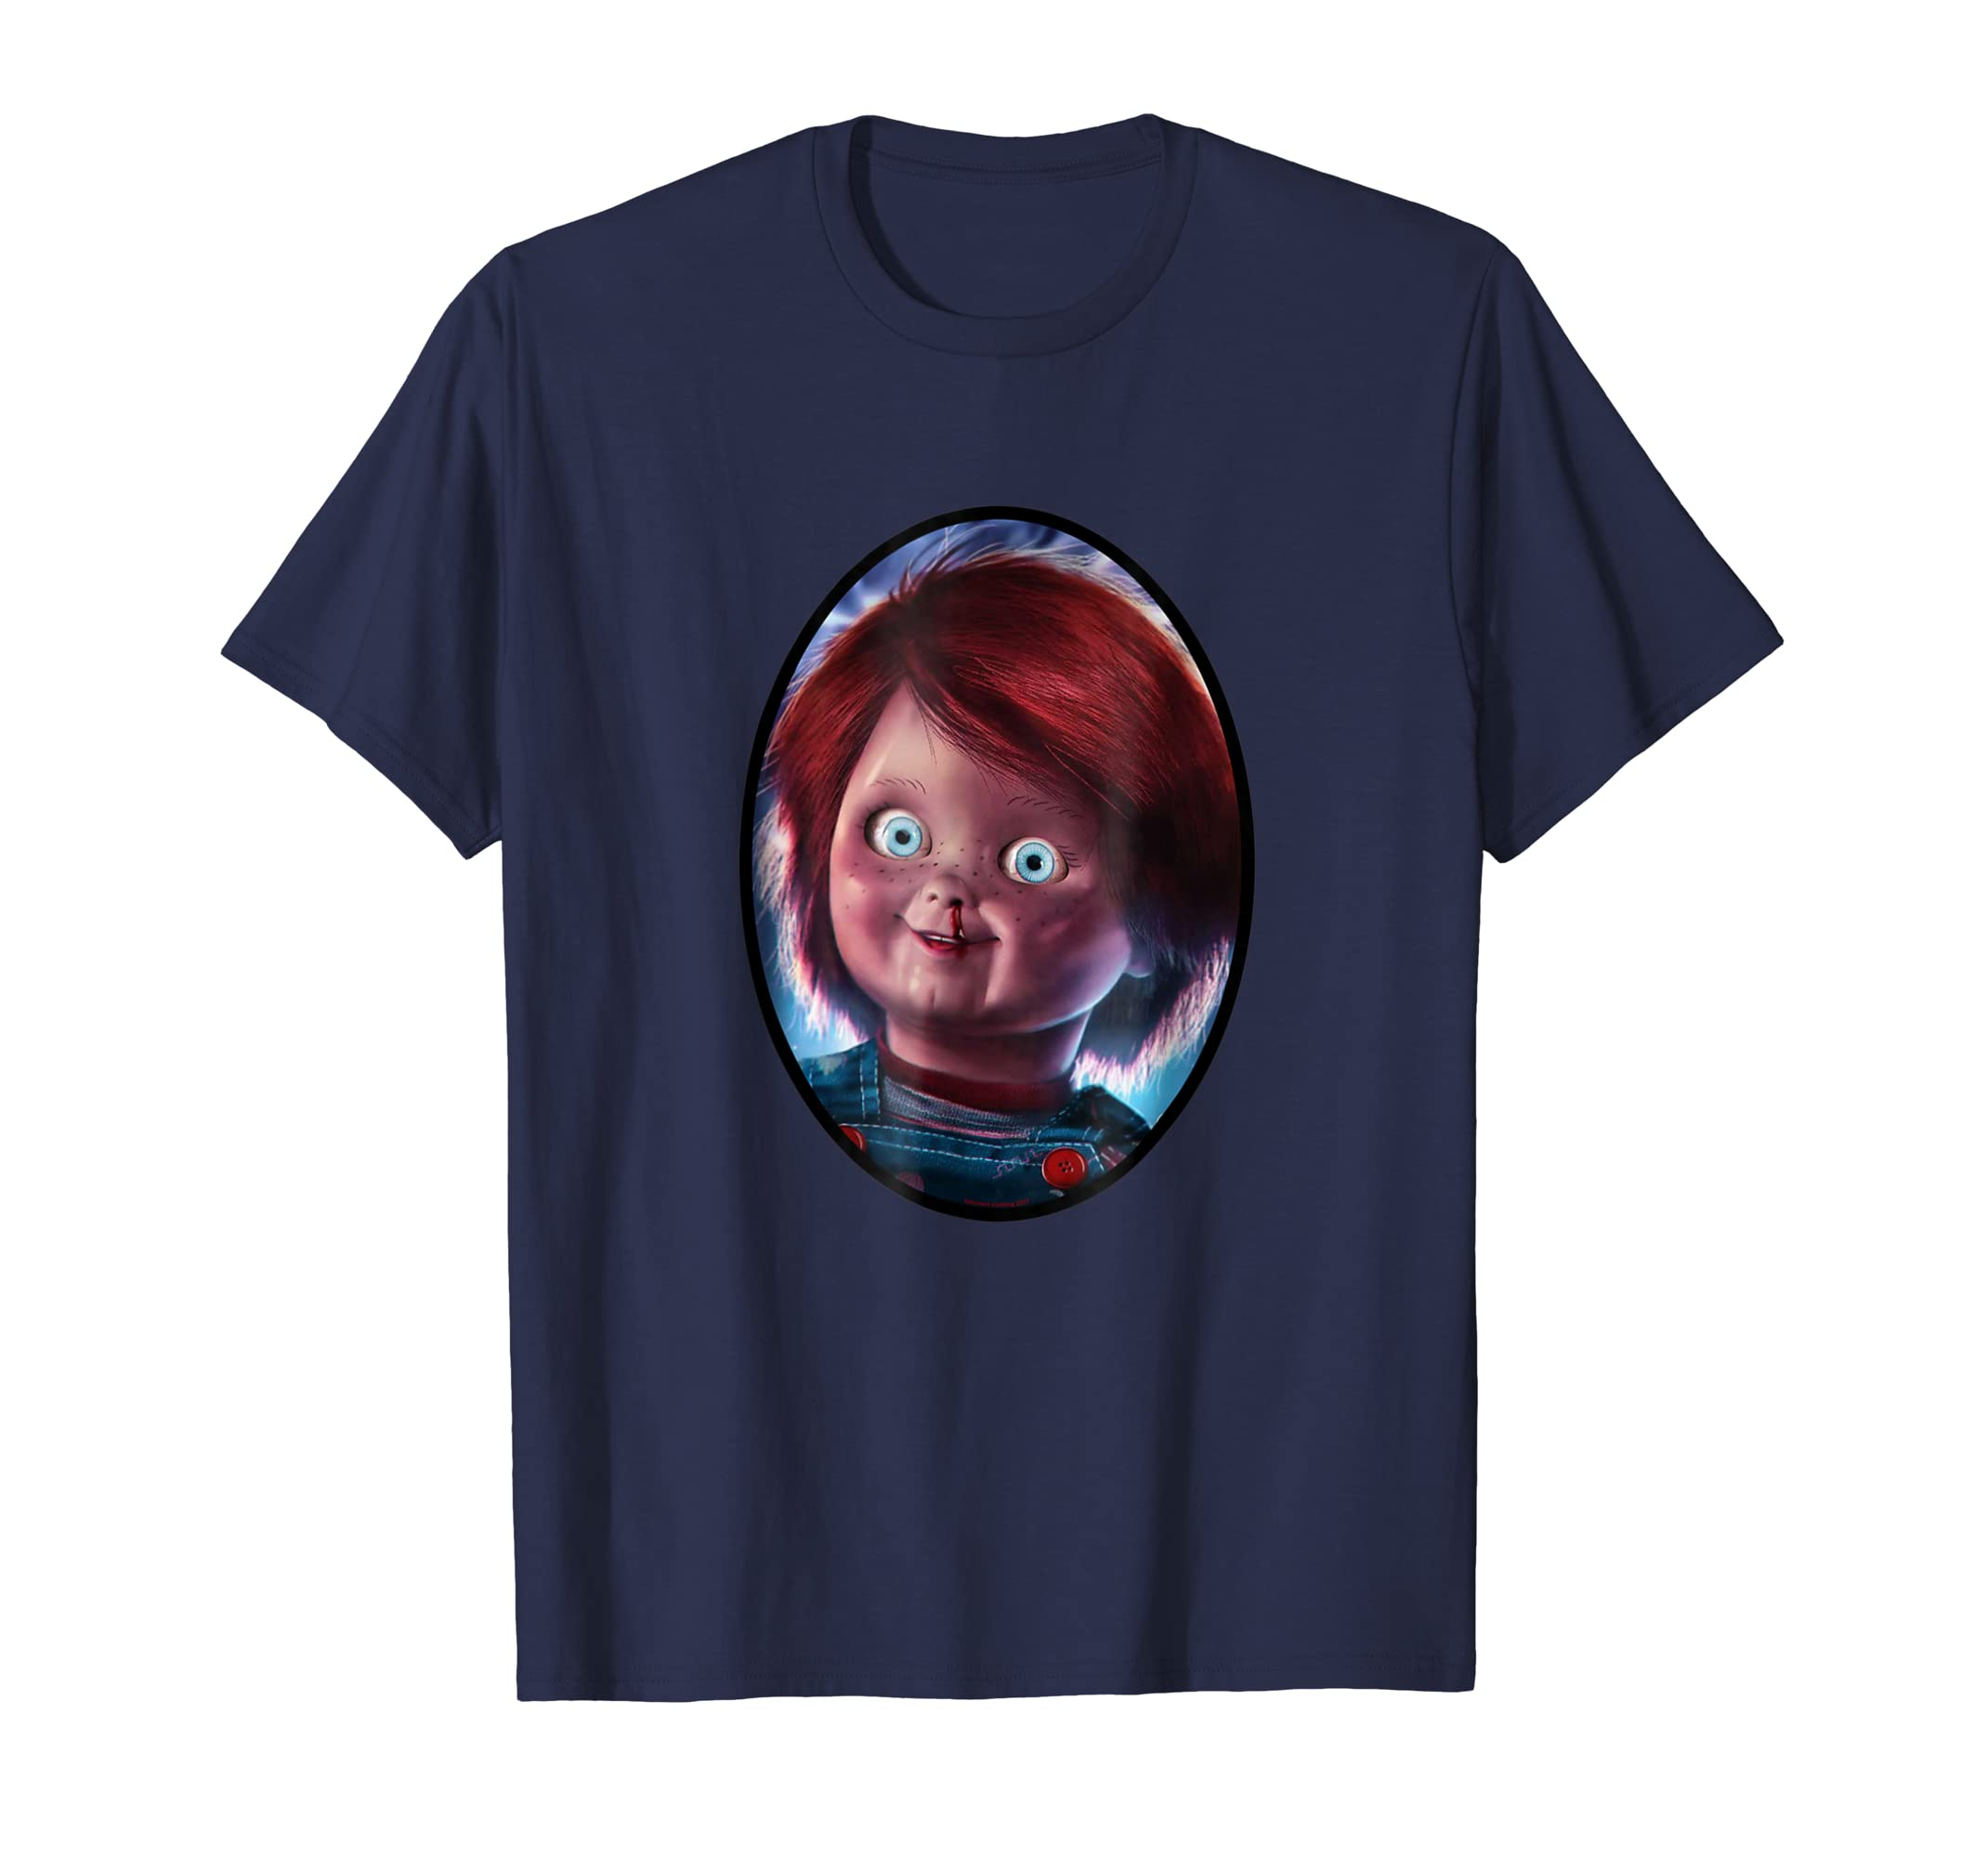 663340d5 Chucky The Good Guy Doll T Shirt-Colonhue – Colonhue.com